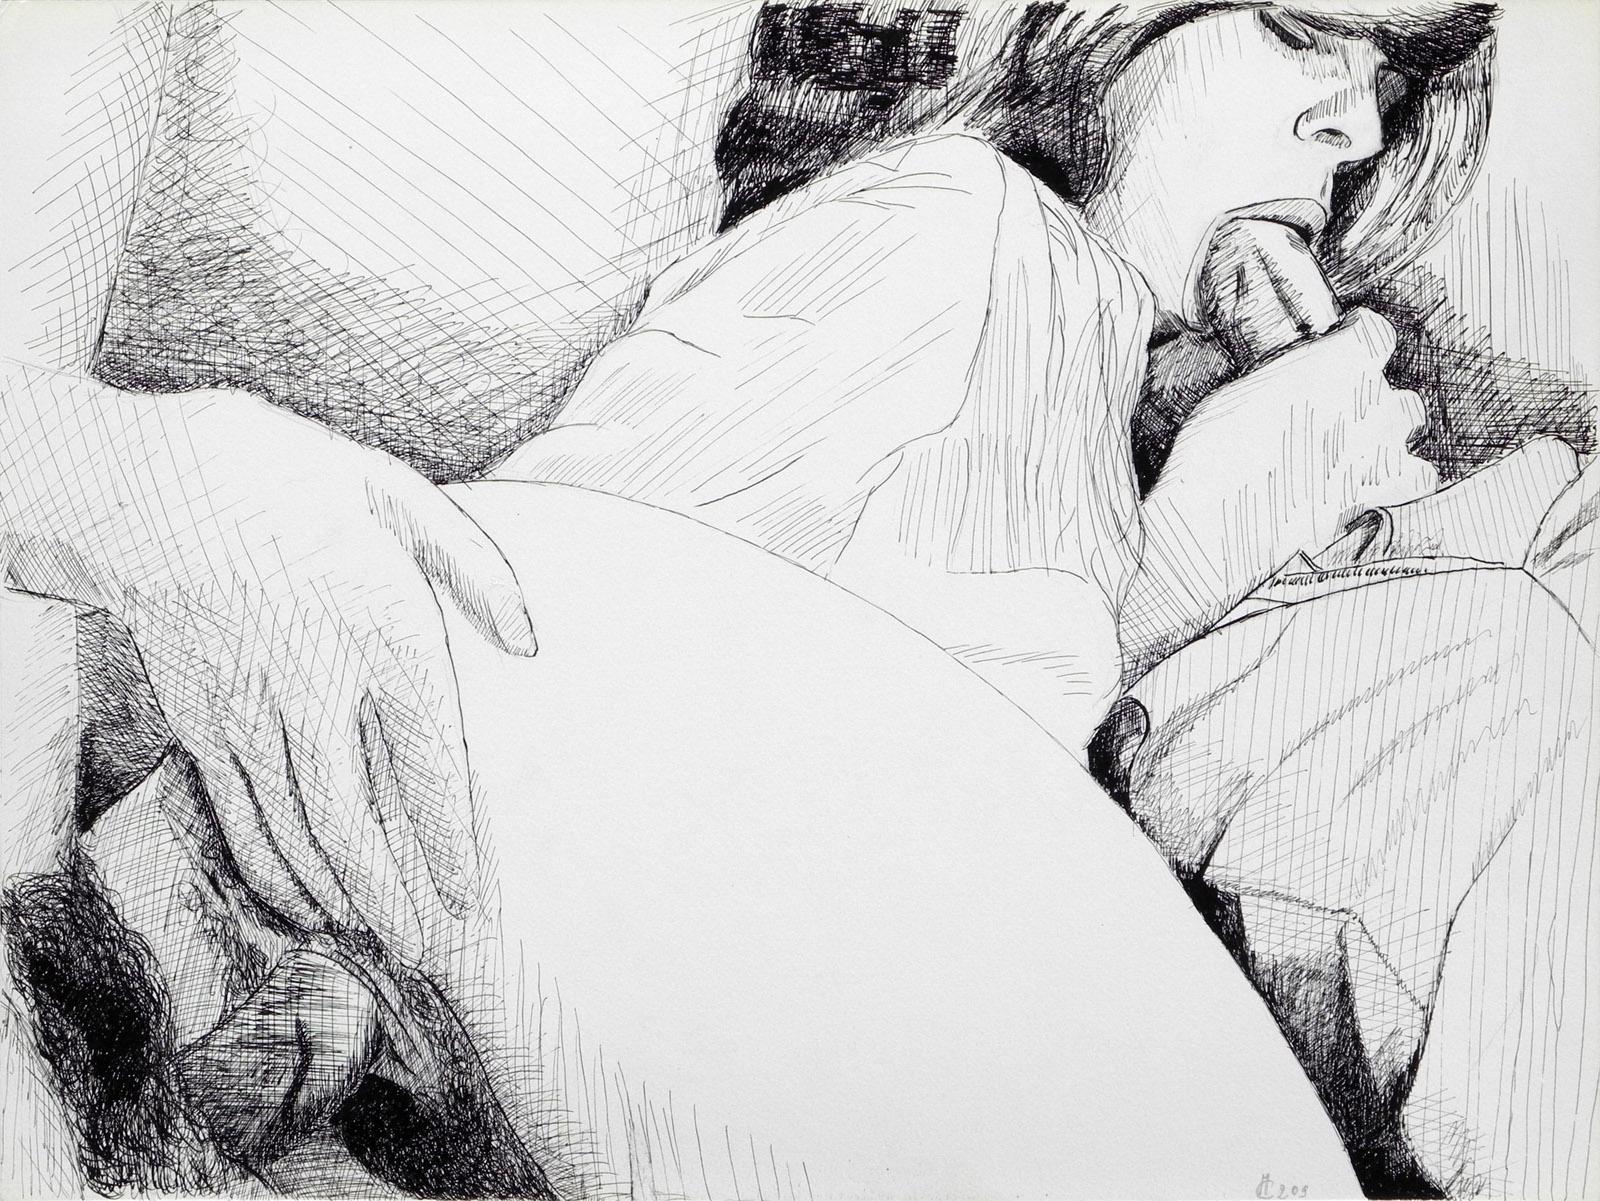 porno dessin animé massage sensuel toulouse